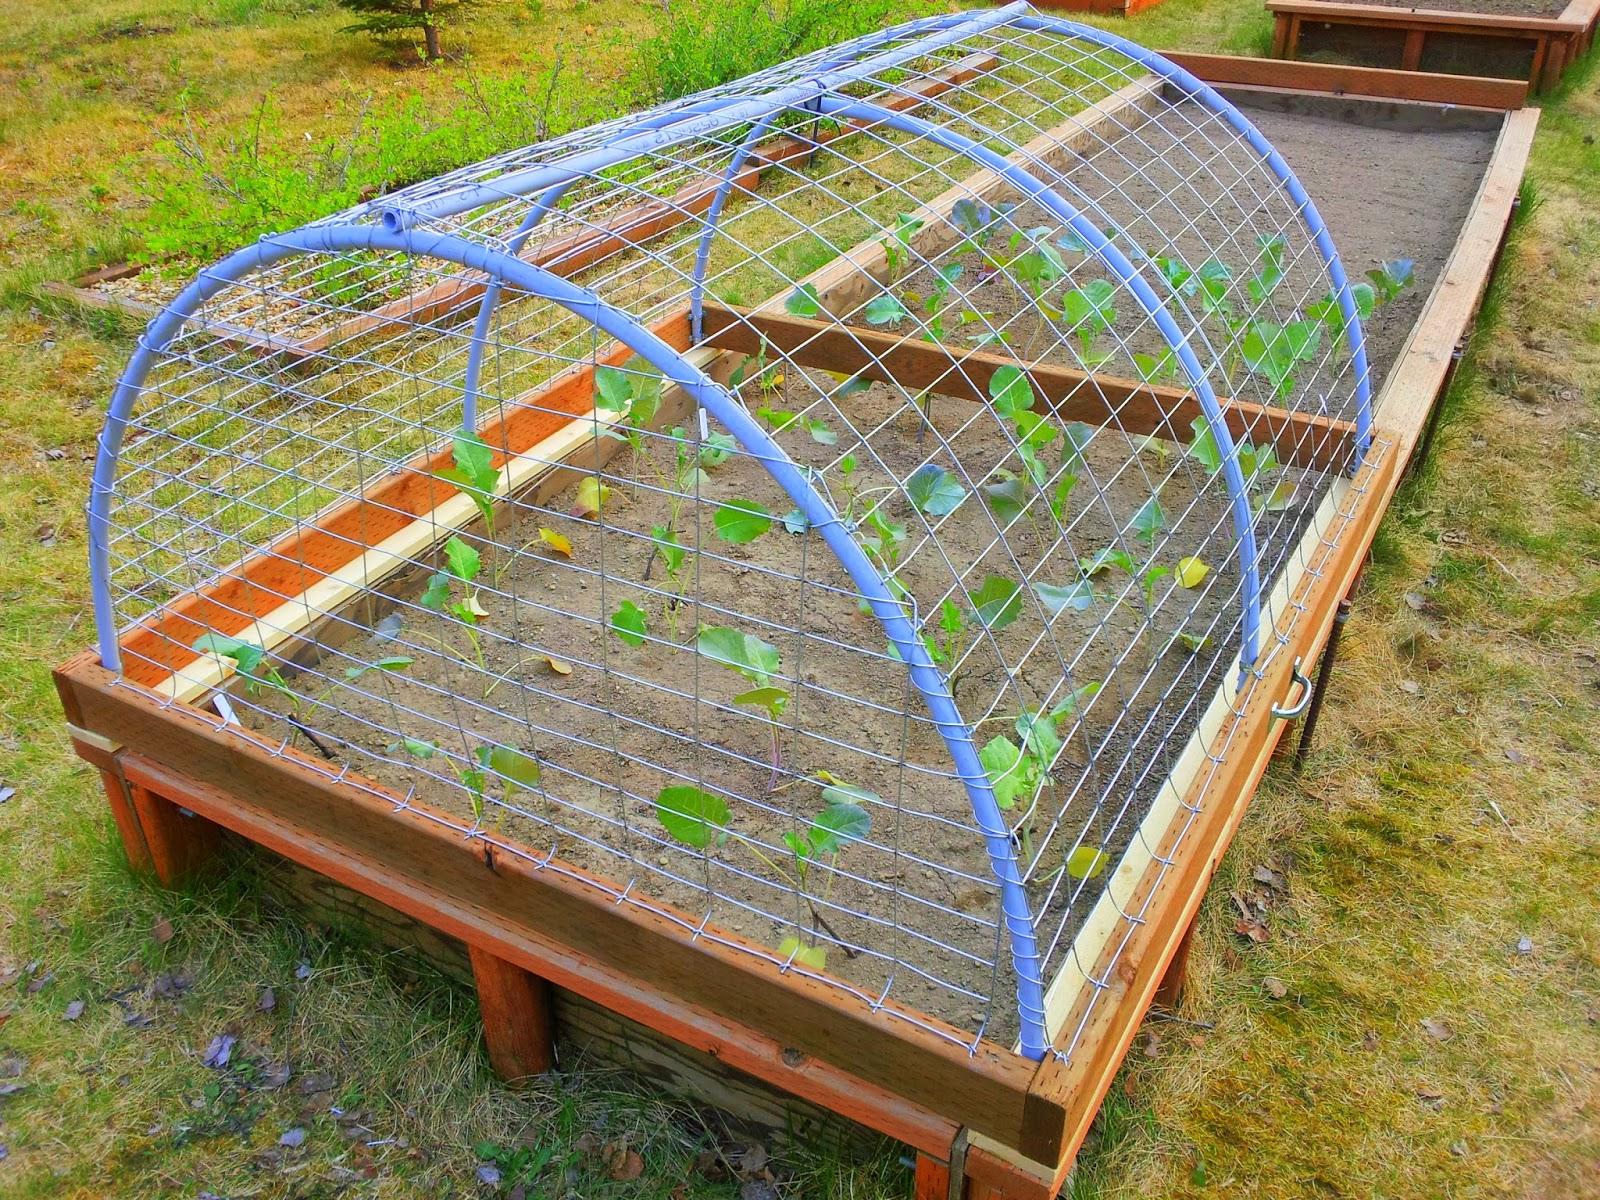 Home Design Ideas bulb cages set of 2 fruit cages fruit cages